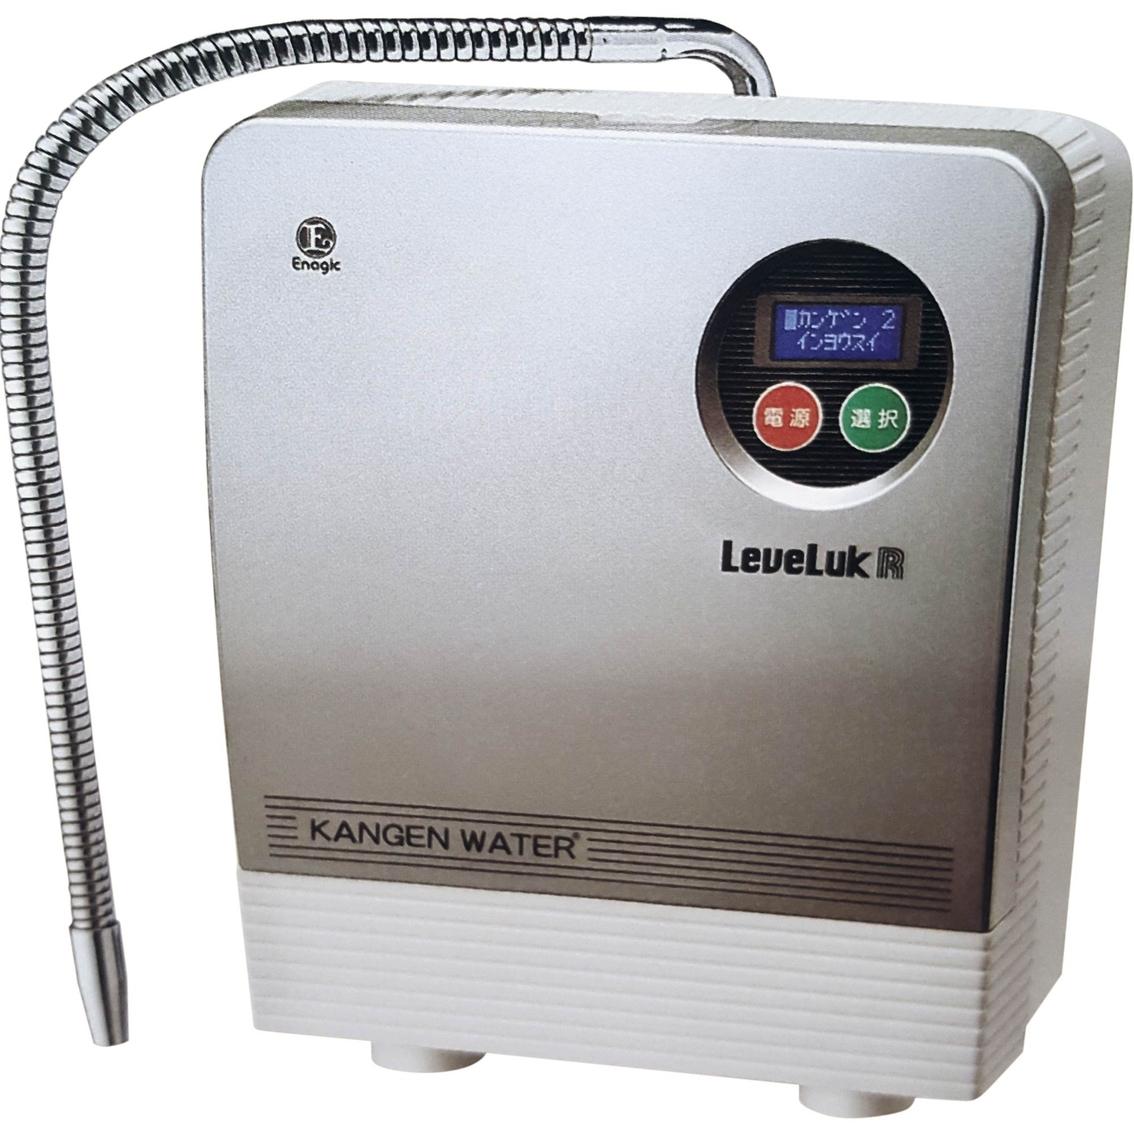 Best Price for Leveluk-R on by Kangen